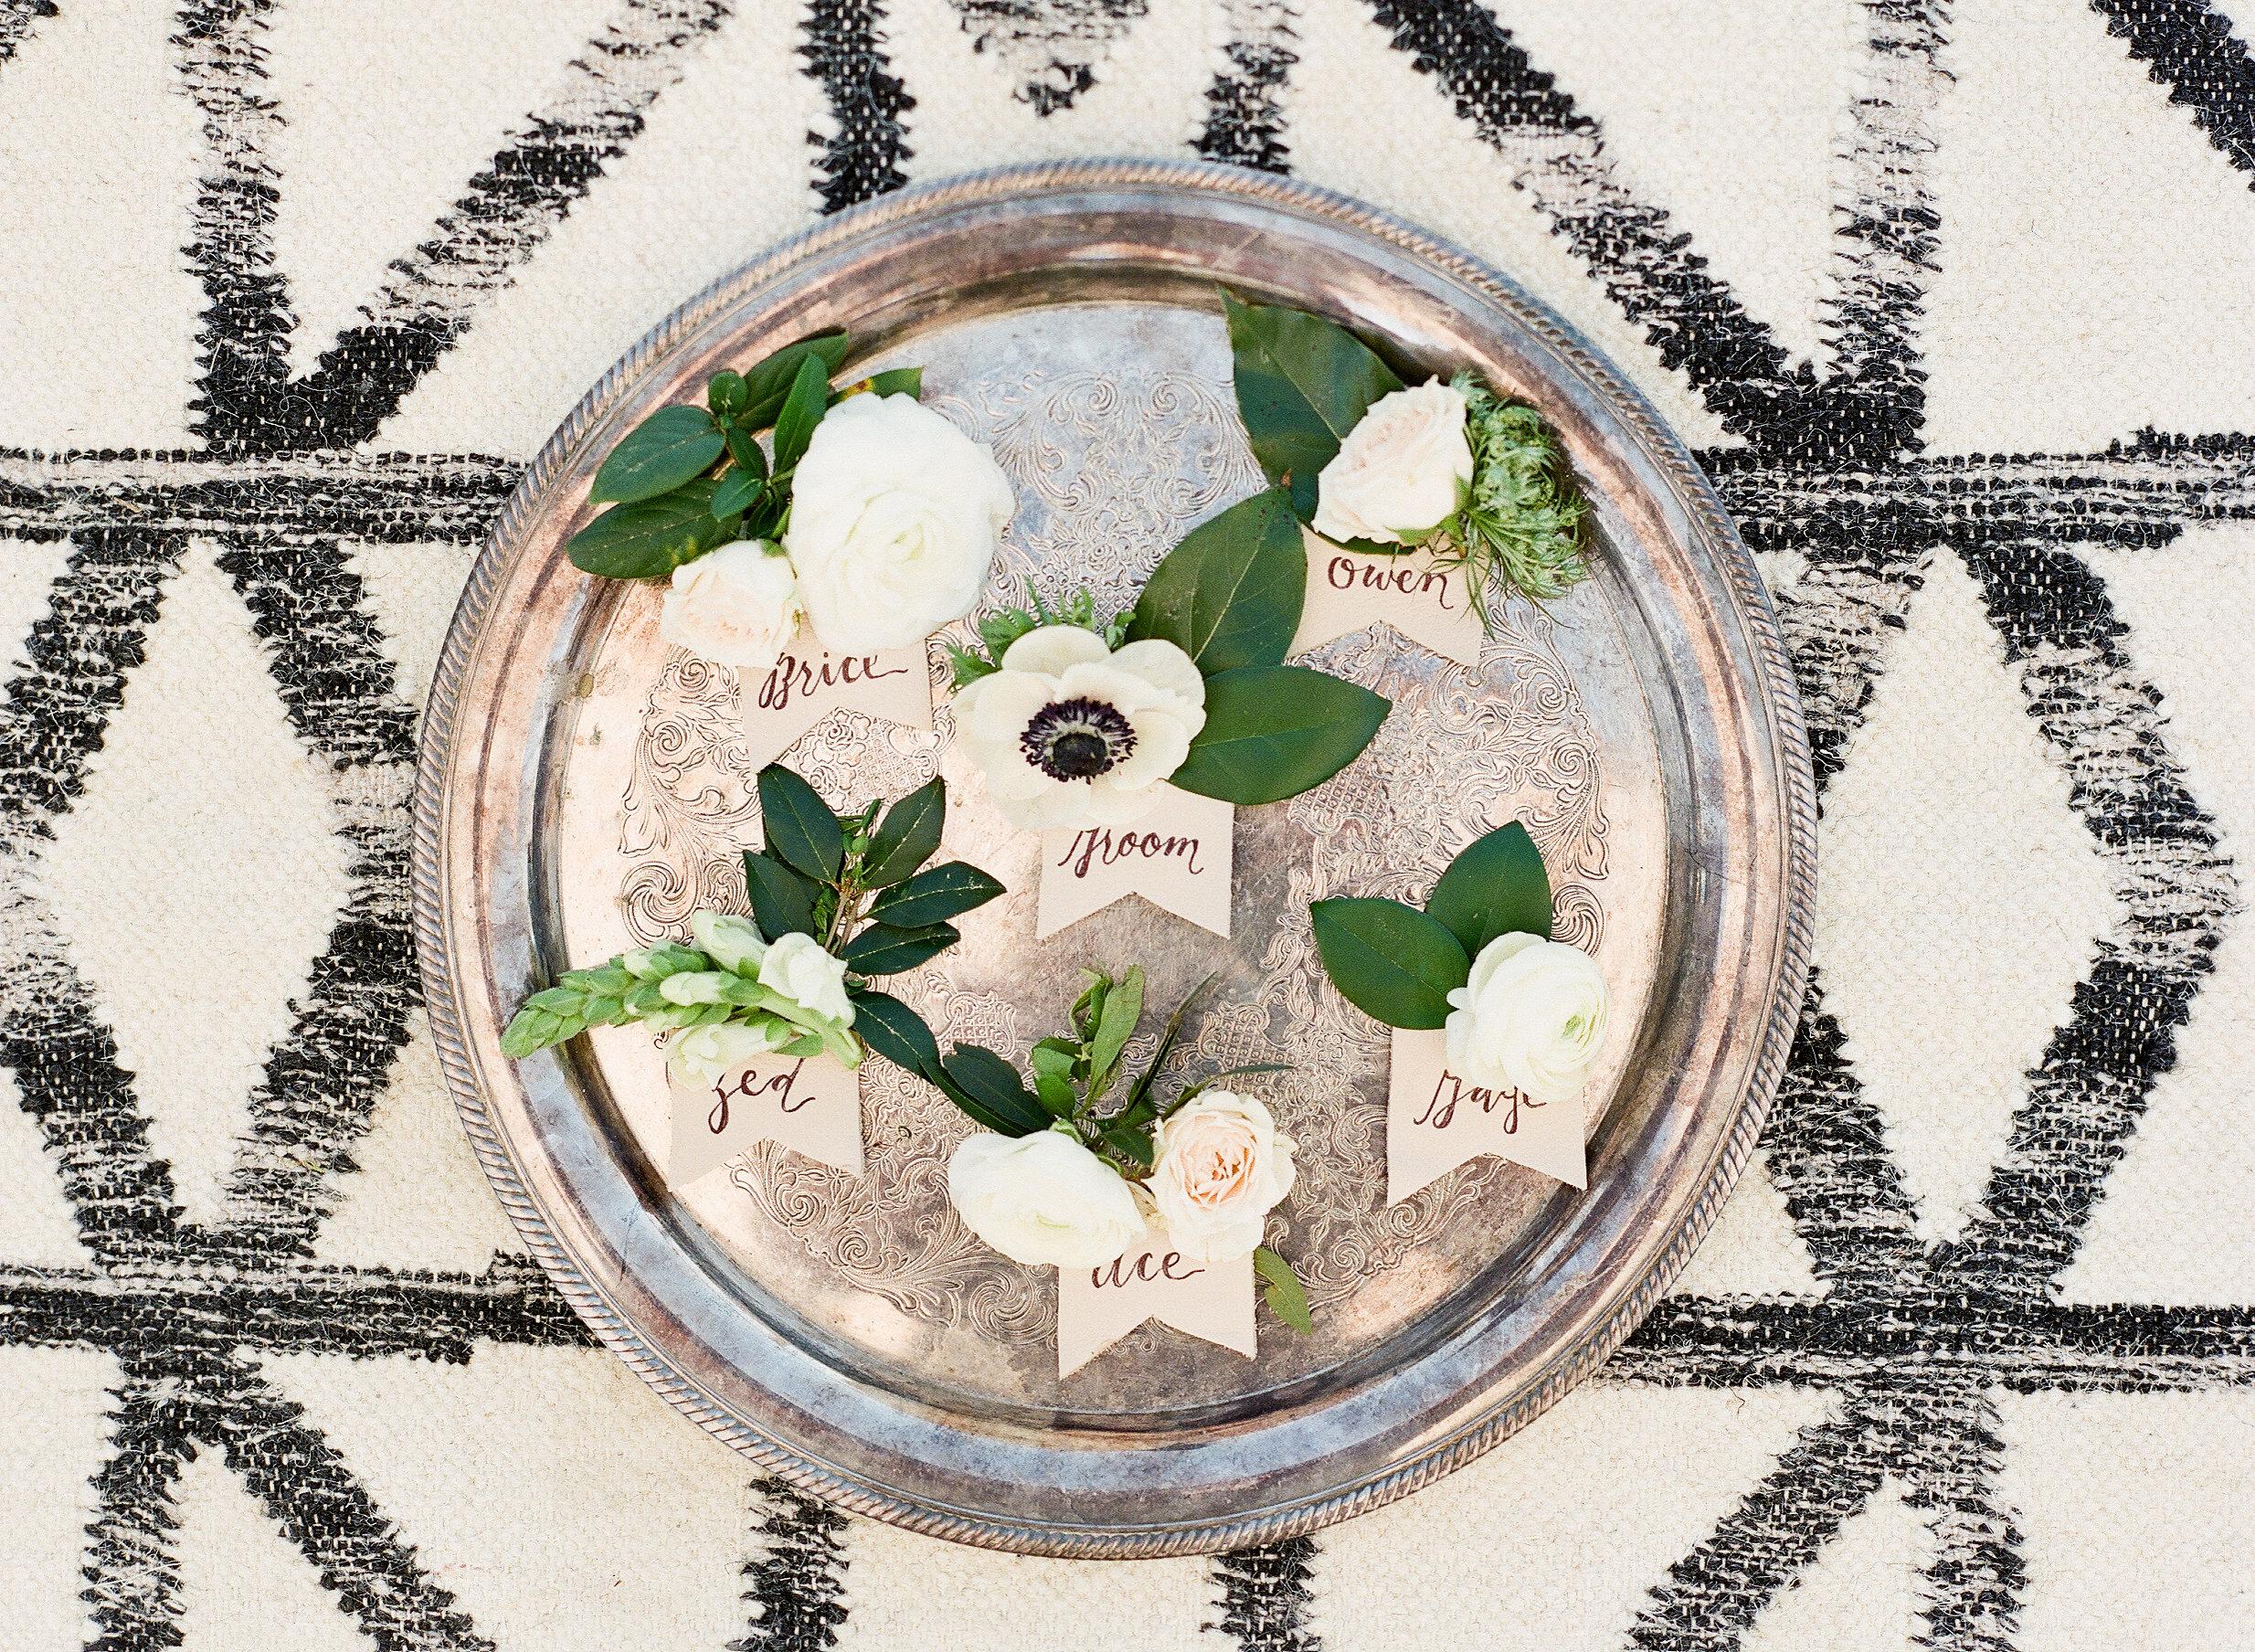 ivory-and-beau-wedding-planning-flowers-florist-calligraphy-bridesmaids-dresses-wedding-dresses-photography-bridal-boutique-savannah-georgia-southern-wedding-coordinator-event-coordinator-bride-3.jpg